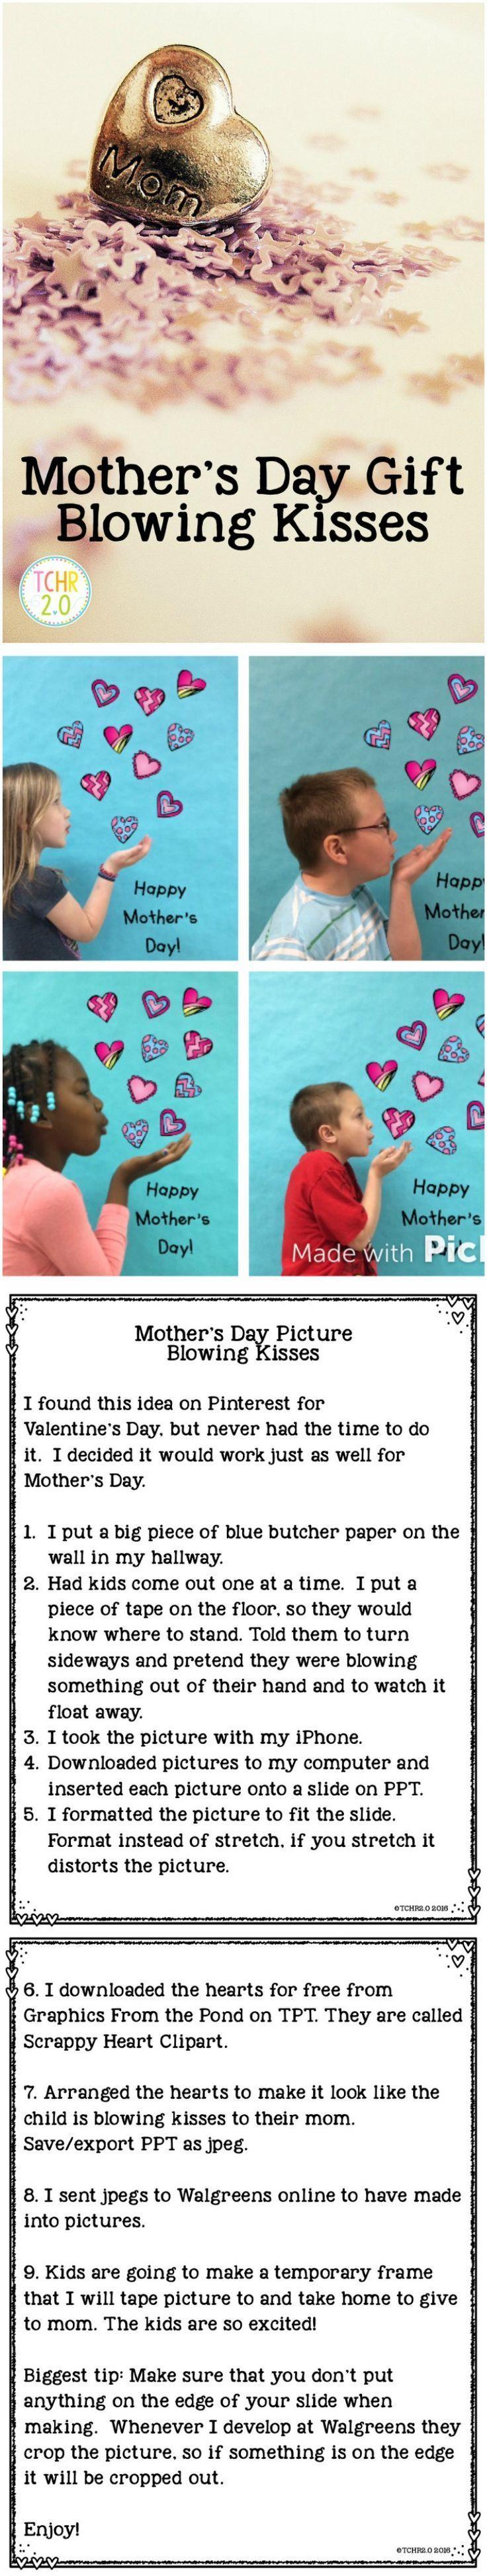 685 best Teacher stuff images on Pinterest | Activities, English and ...